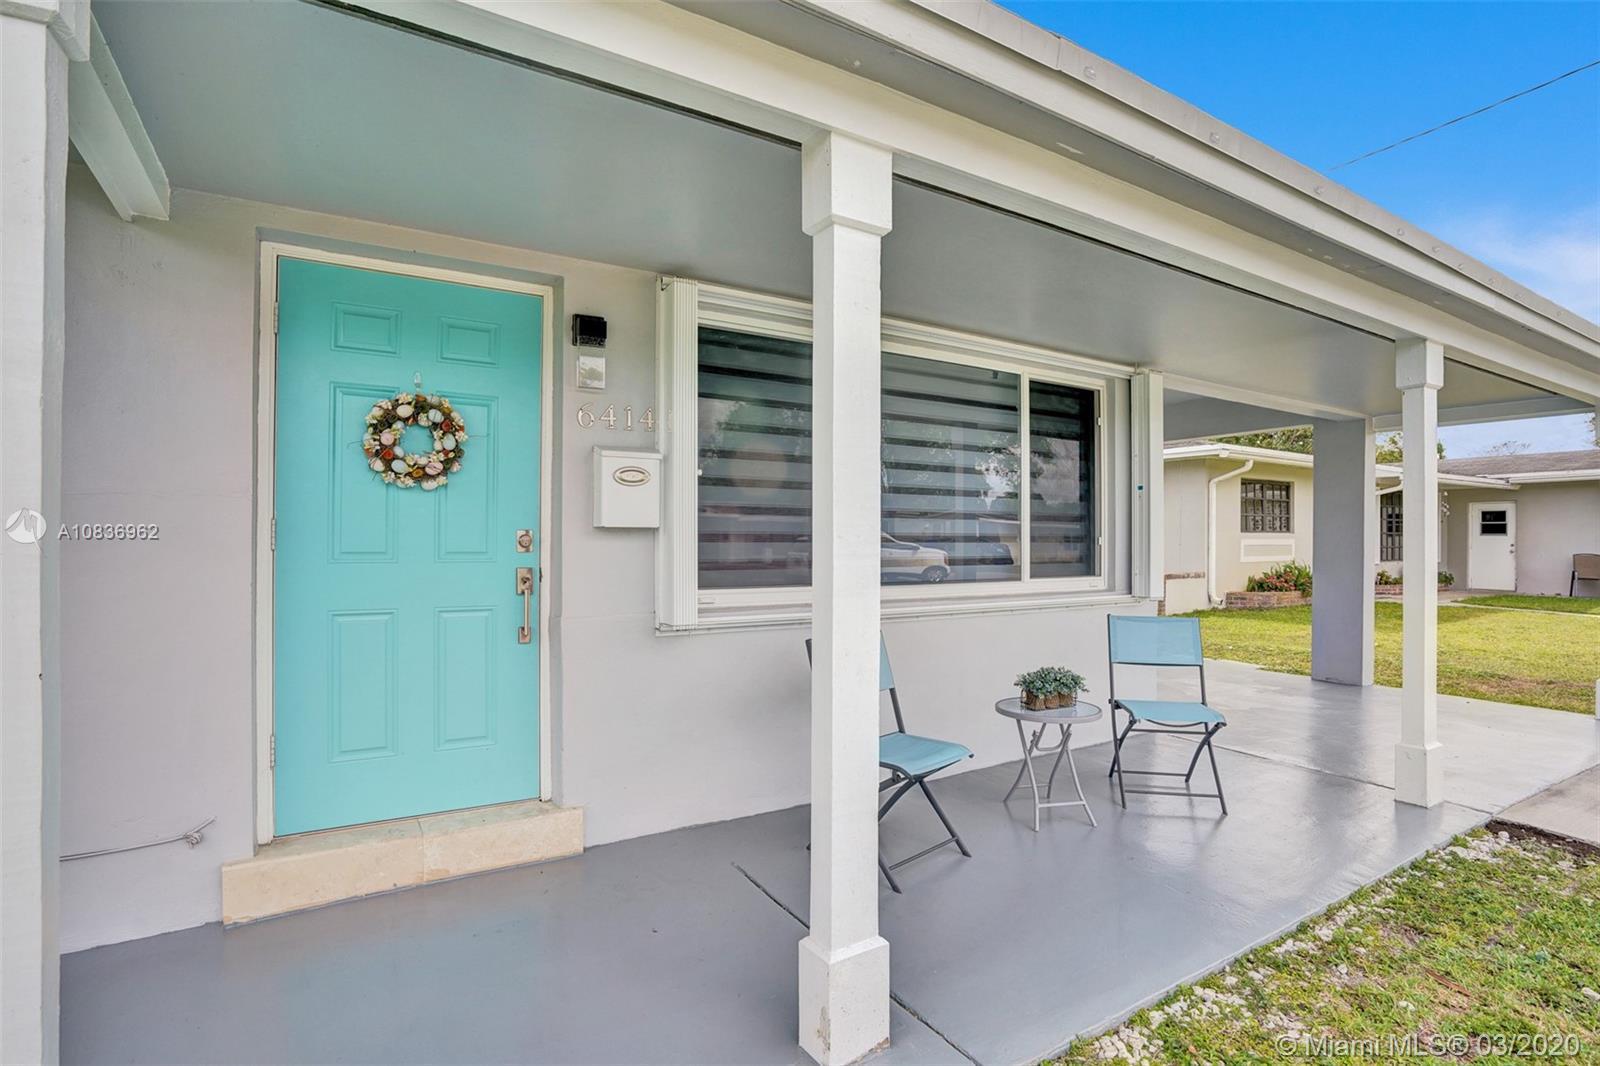 6414 SW 7th St, Pembroke Pines, FL 33023 - Pembroke Pines, FL real estate listing